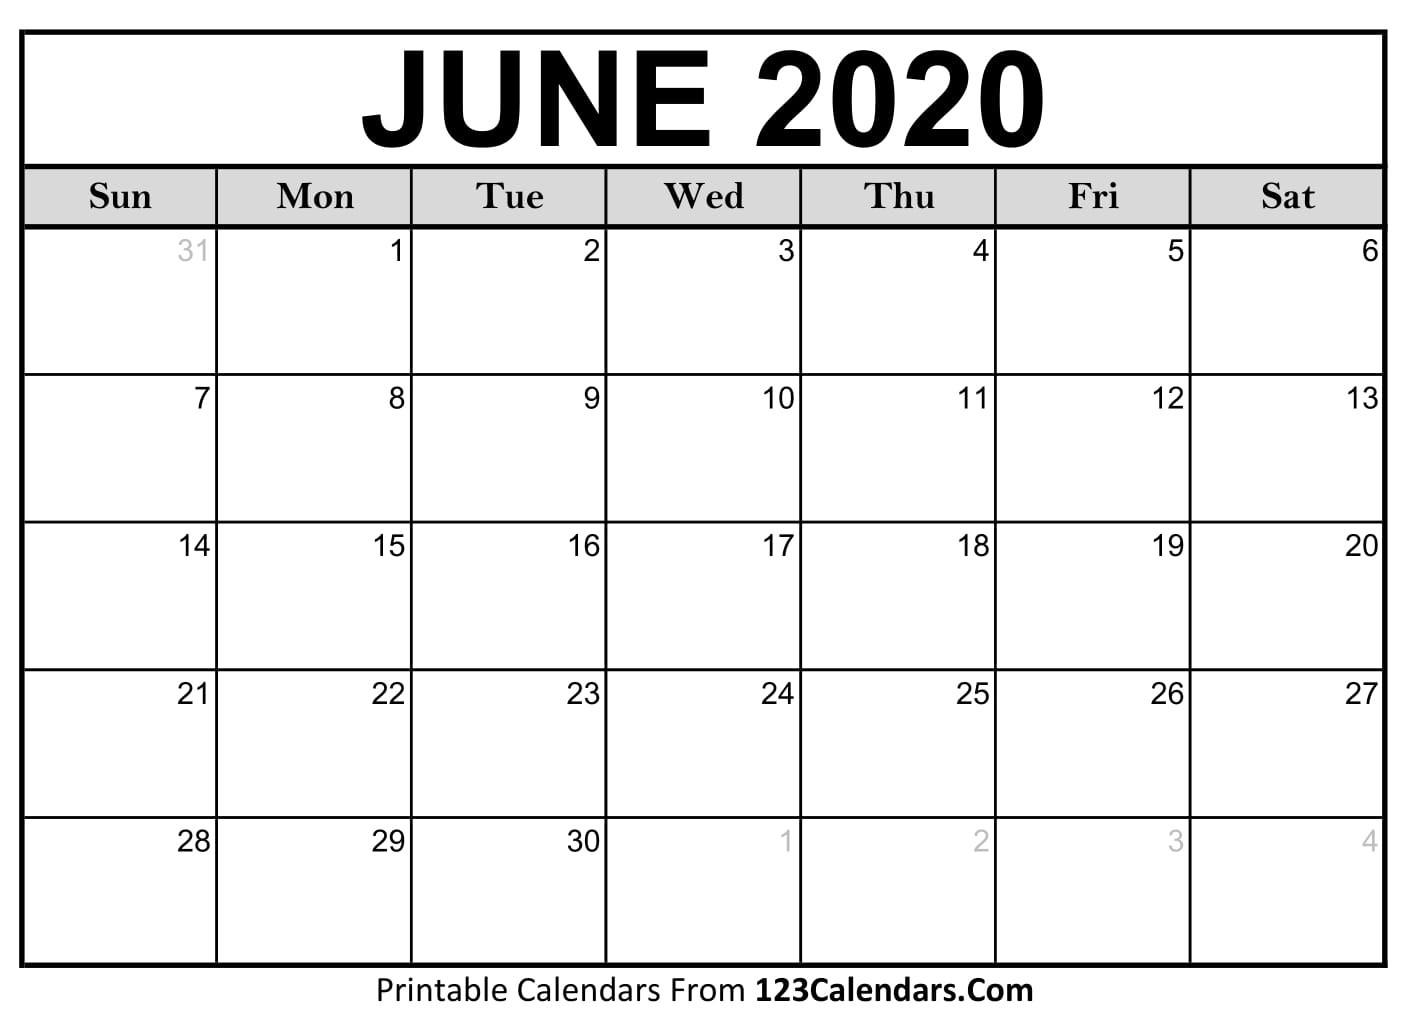 June 2020 Printable Calendar | 123Calendars-Monthly Calendar June-July 2020